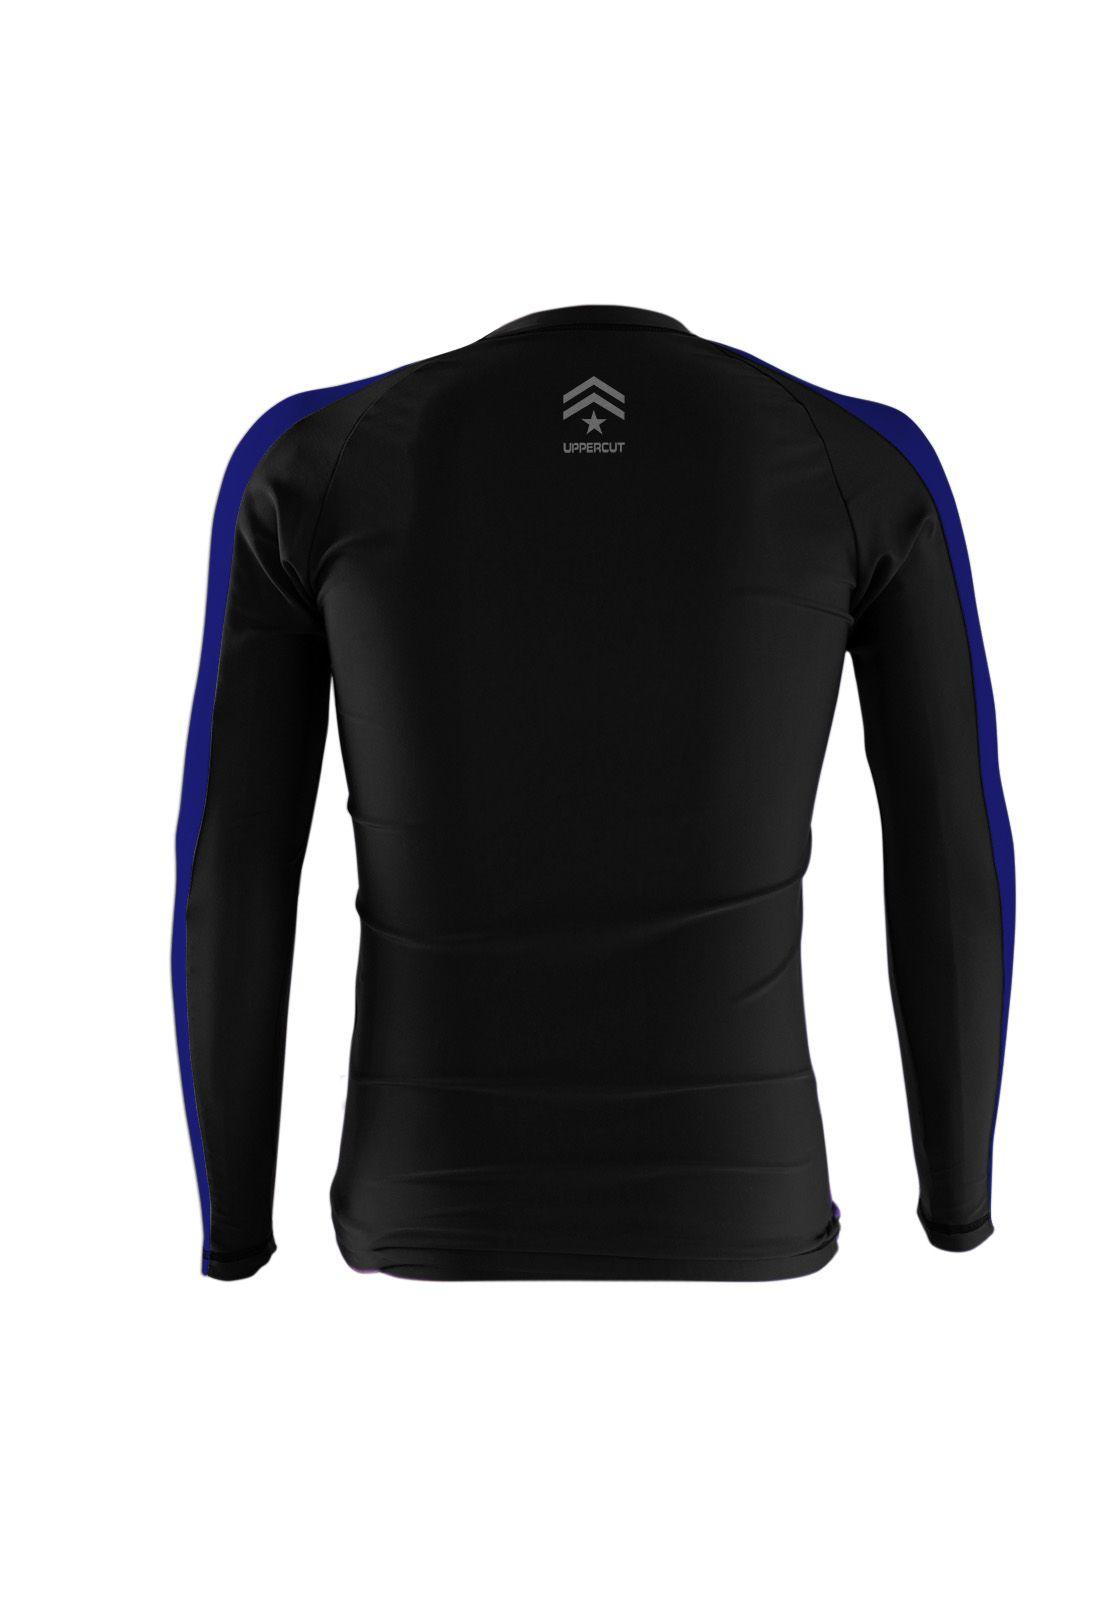 Camisa Rash Guard Justiceiro War R-3 - Preto/Azul - Uppercut  - Loja do Competidor